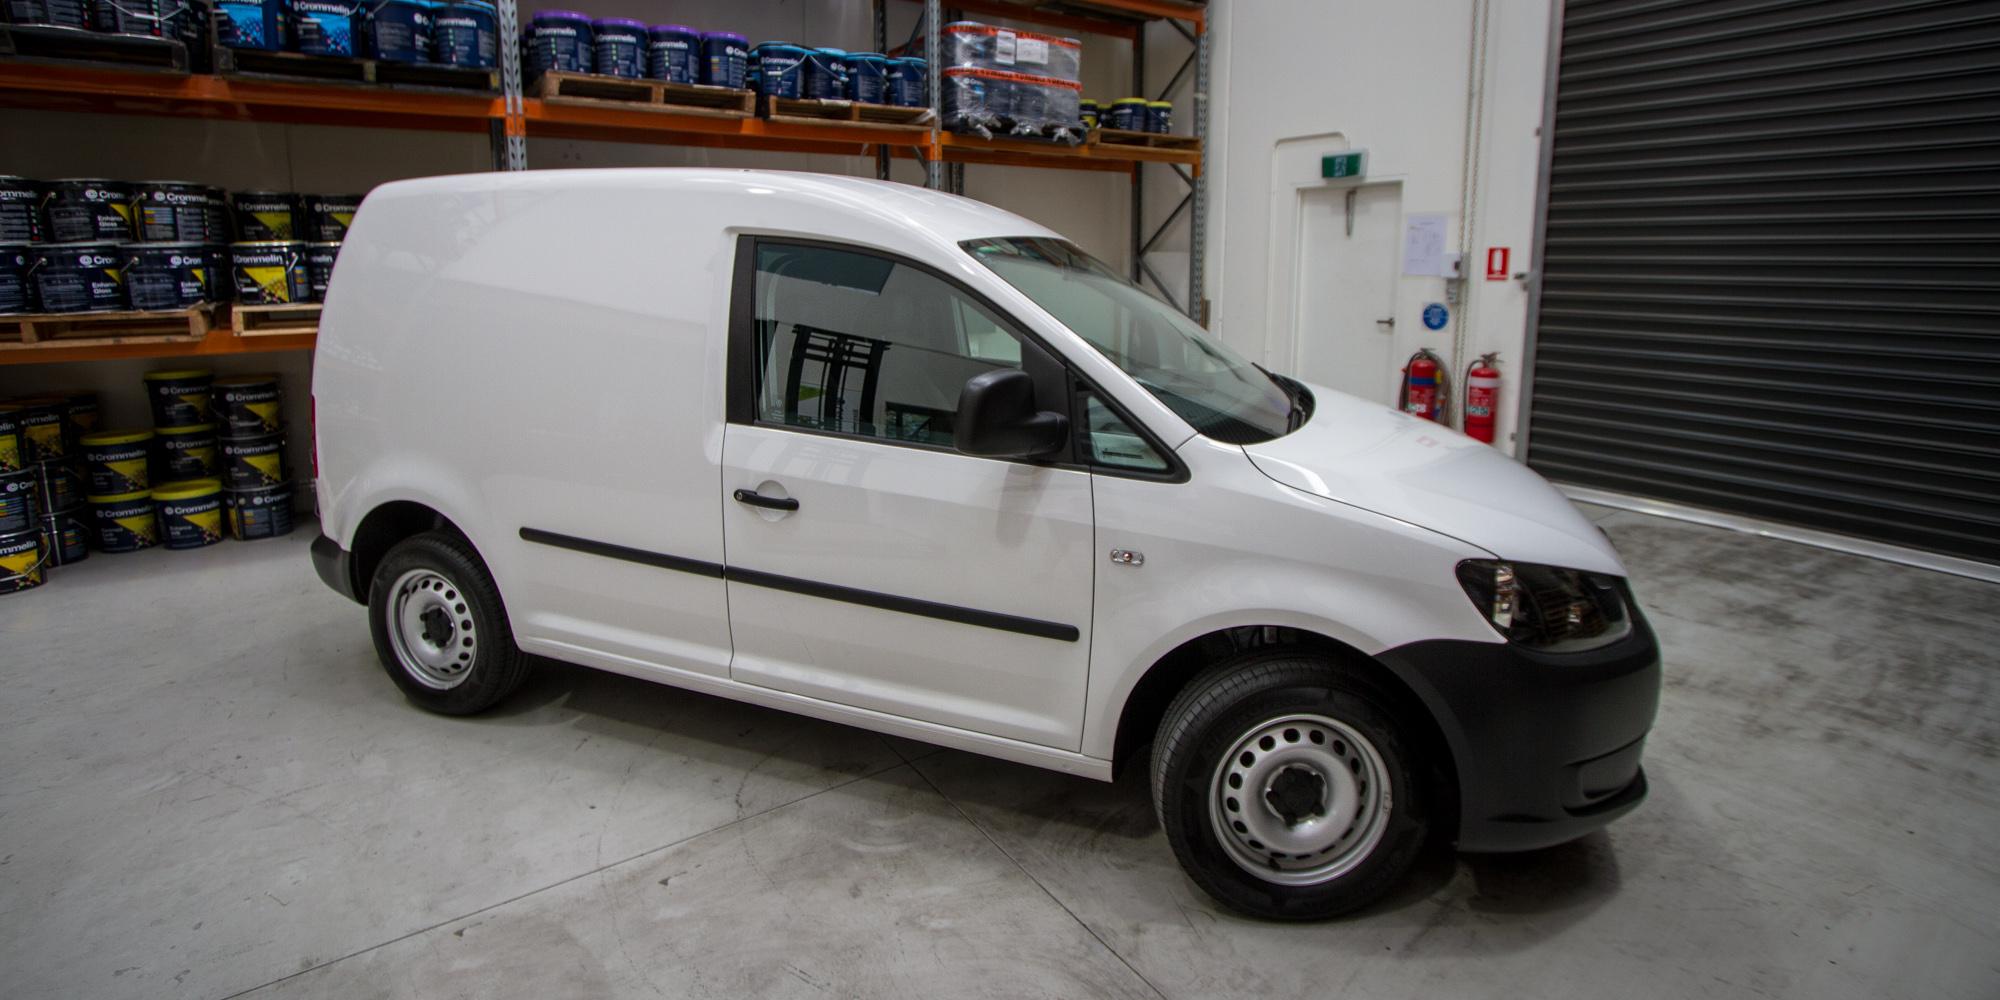 Light van comparison fiat doblo v renault kangoo v for Auto motor club comparisons